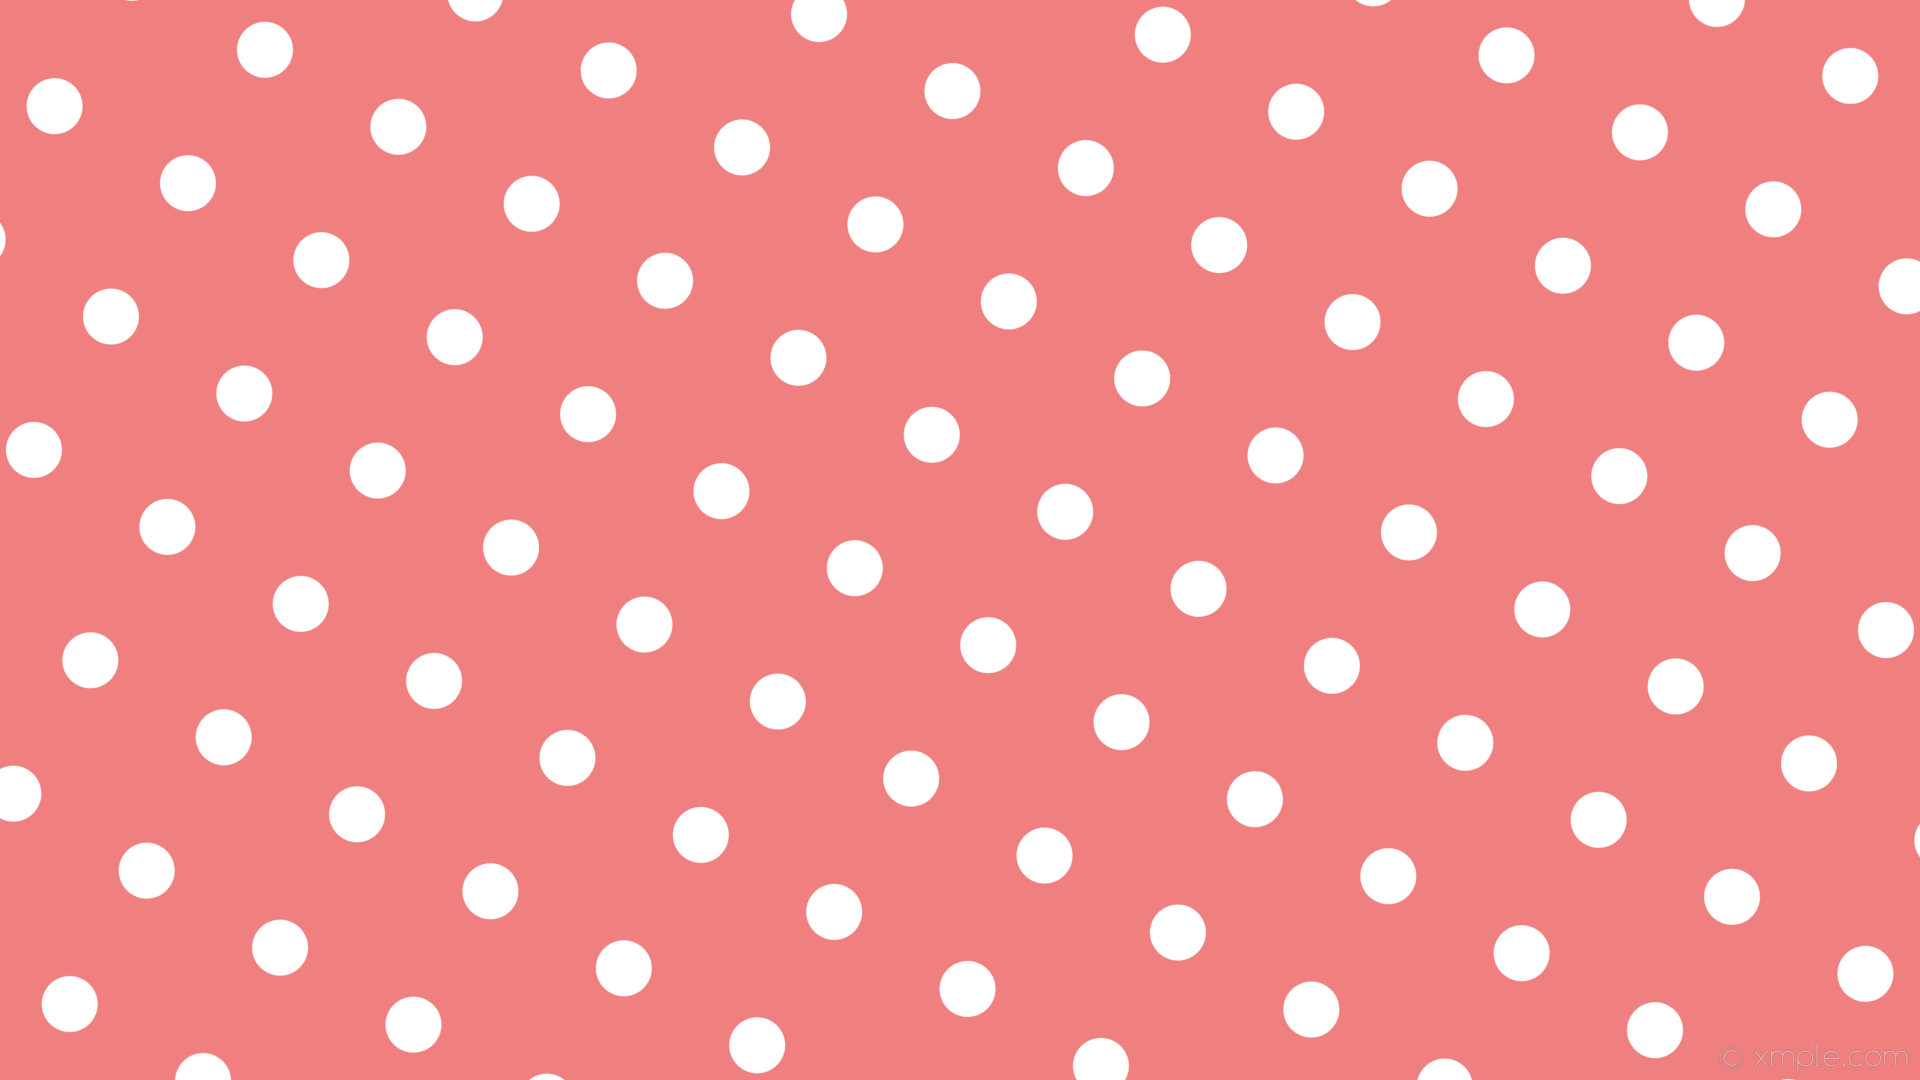 1920x1080 Wallpaper Spots Purple White Polka Dots Dark Violet 9400d3 Ffffff 120A 132px 285px